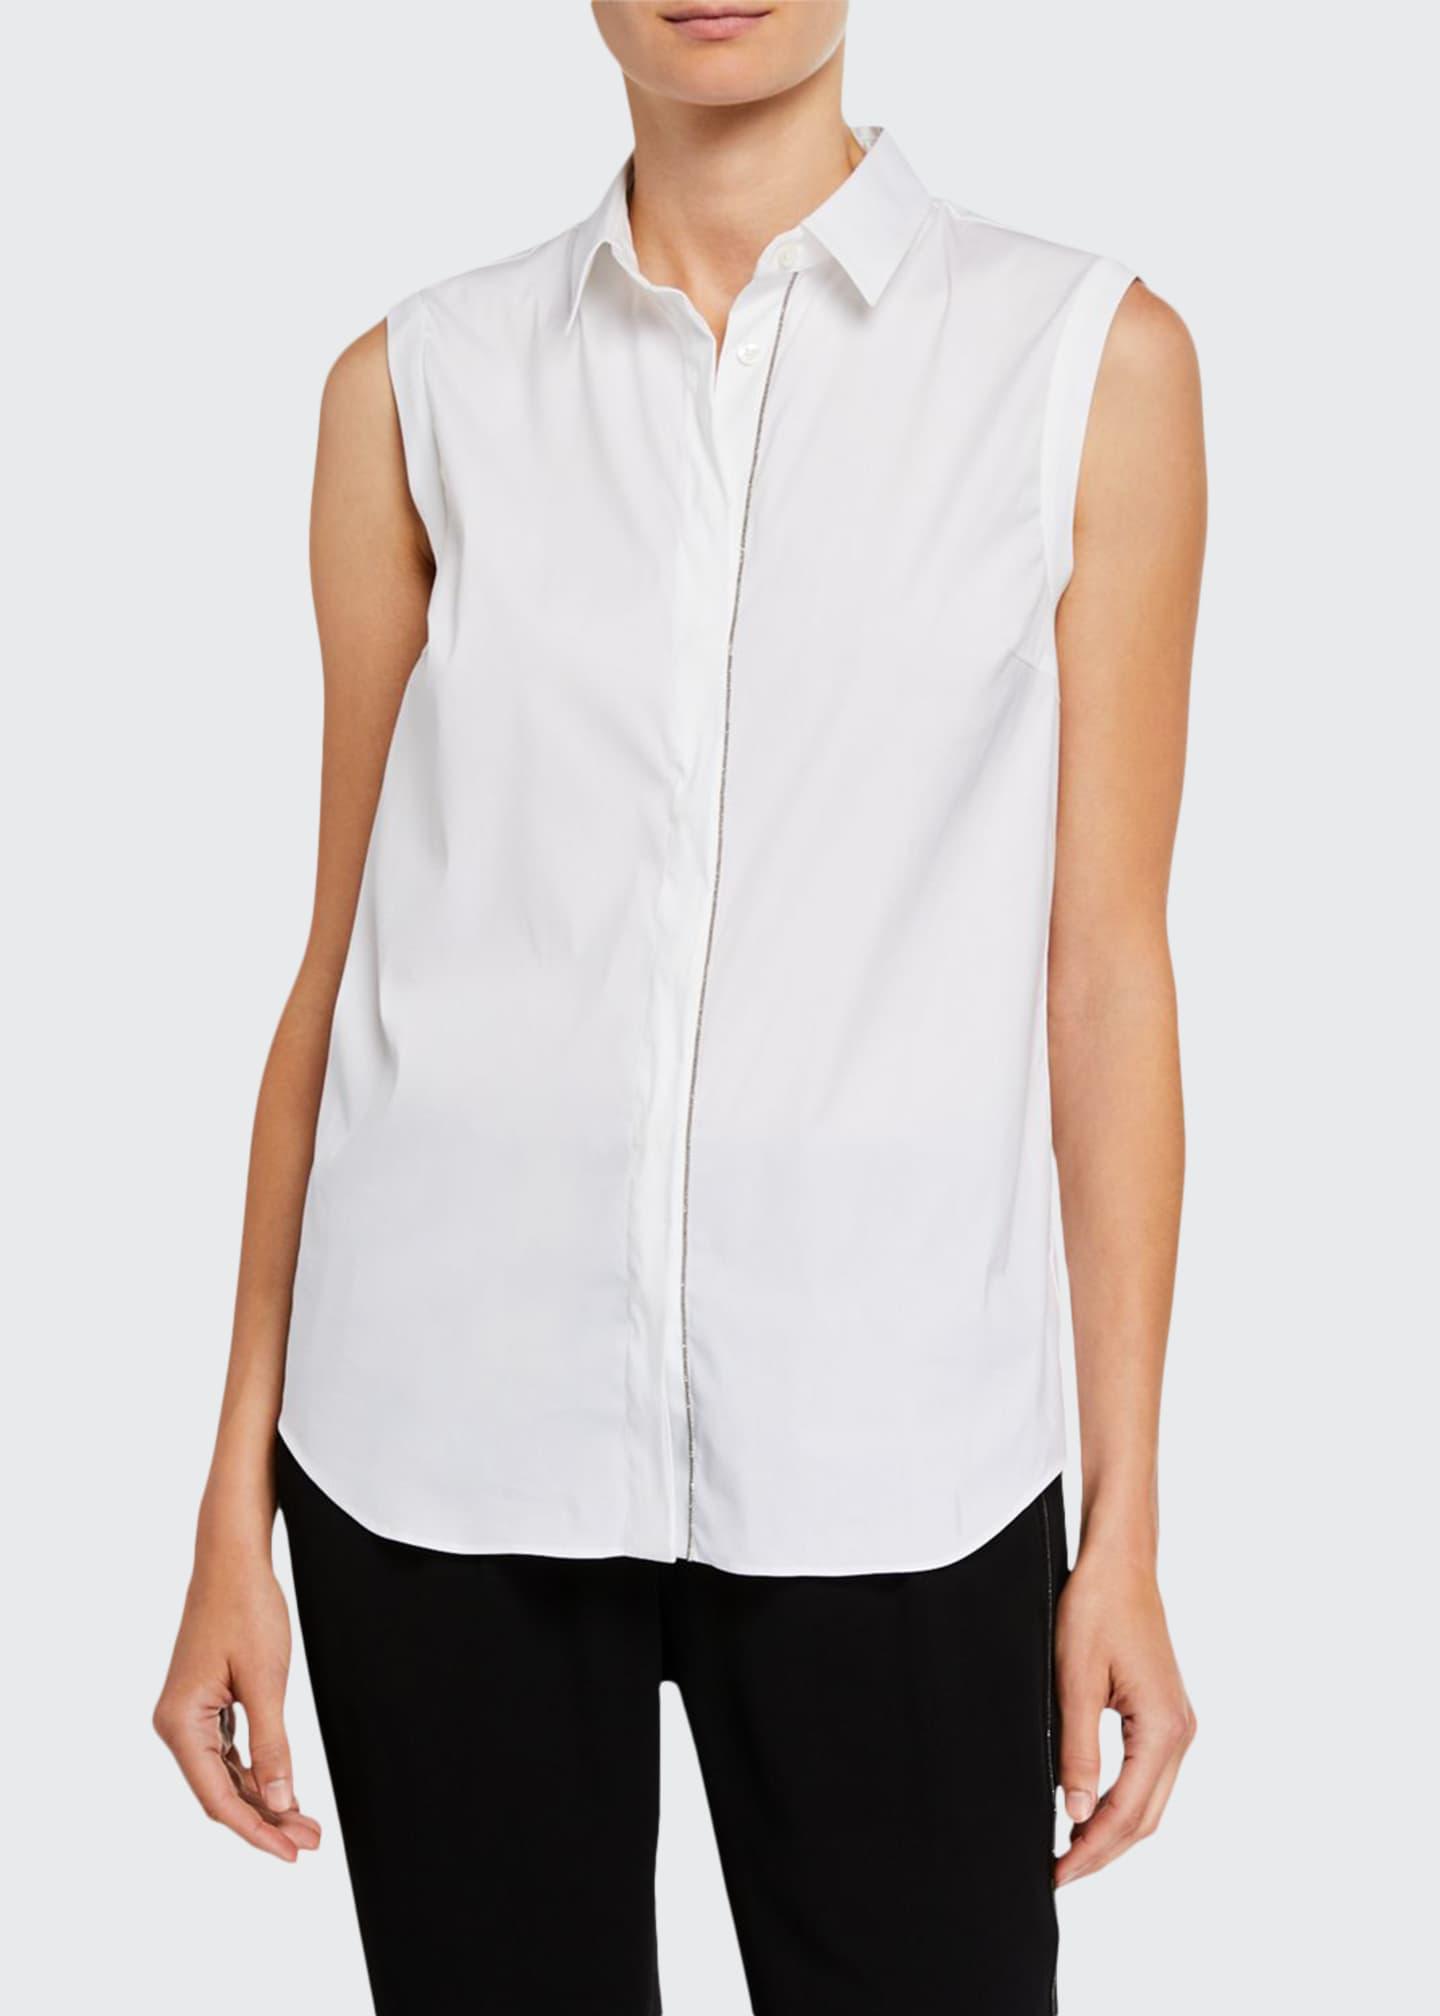 Brunello Cucinelli Monili-Beaded Sleeveless Poplin Shirt